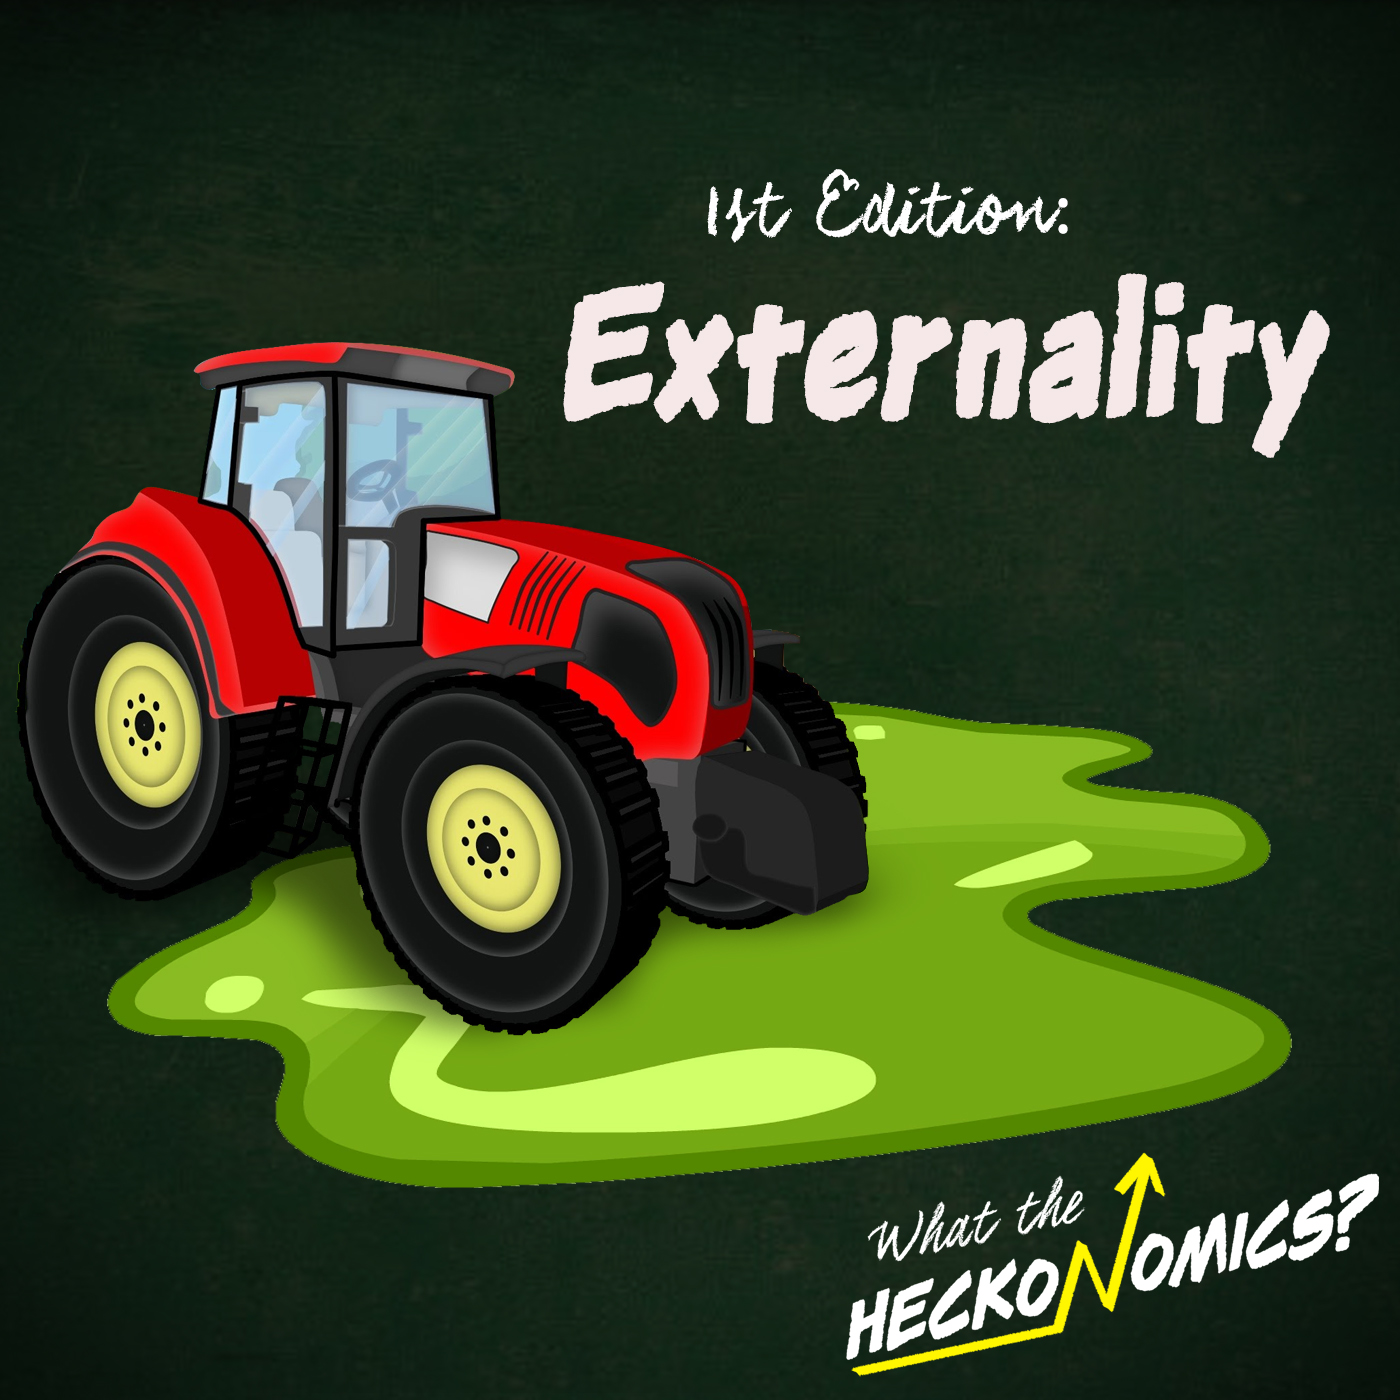 01_externality.jpg